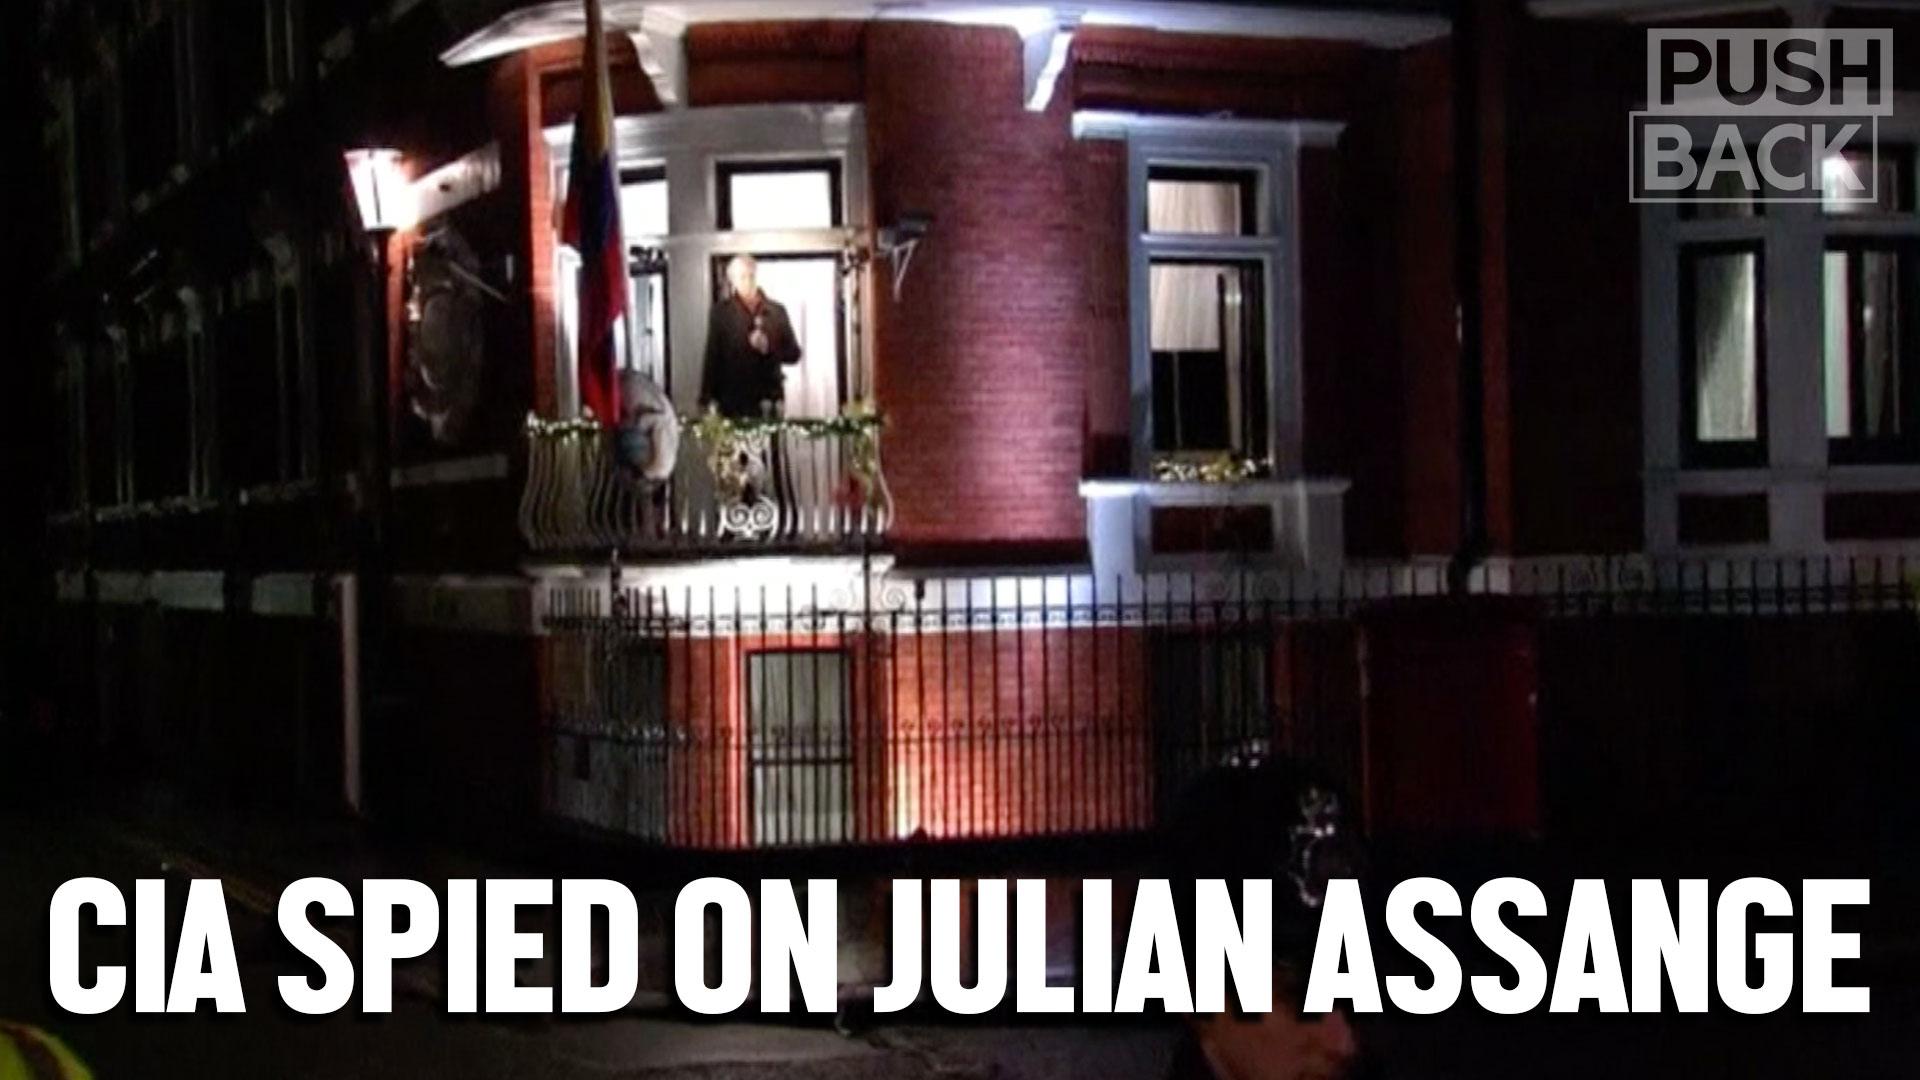 CIA spied on Julian Assange 24/7 in Ecuadorian embassy